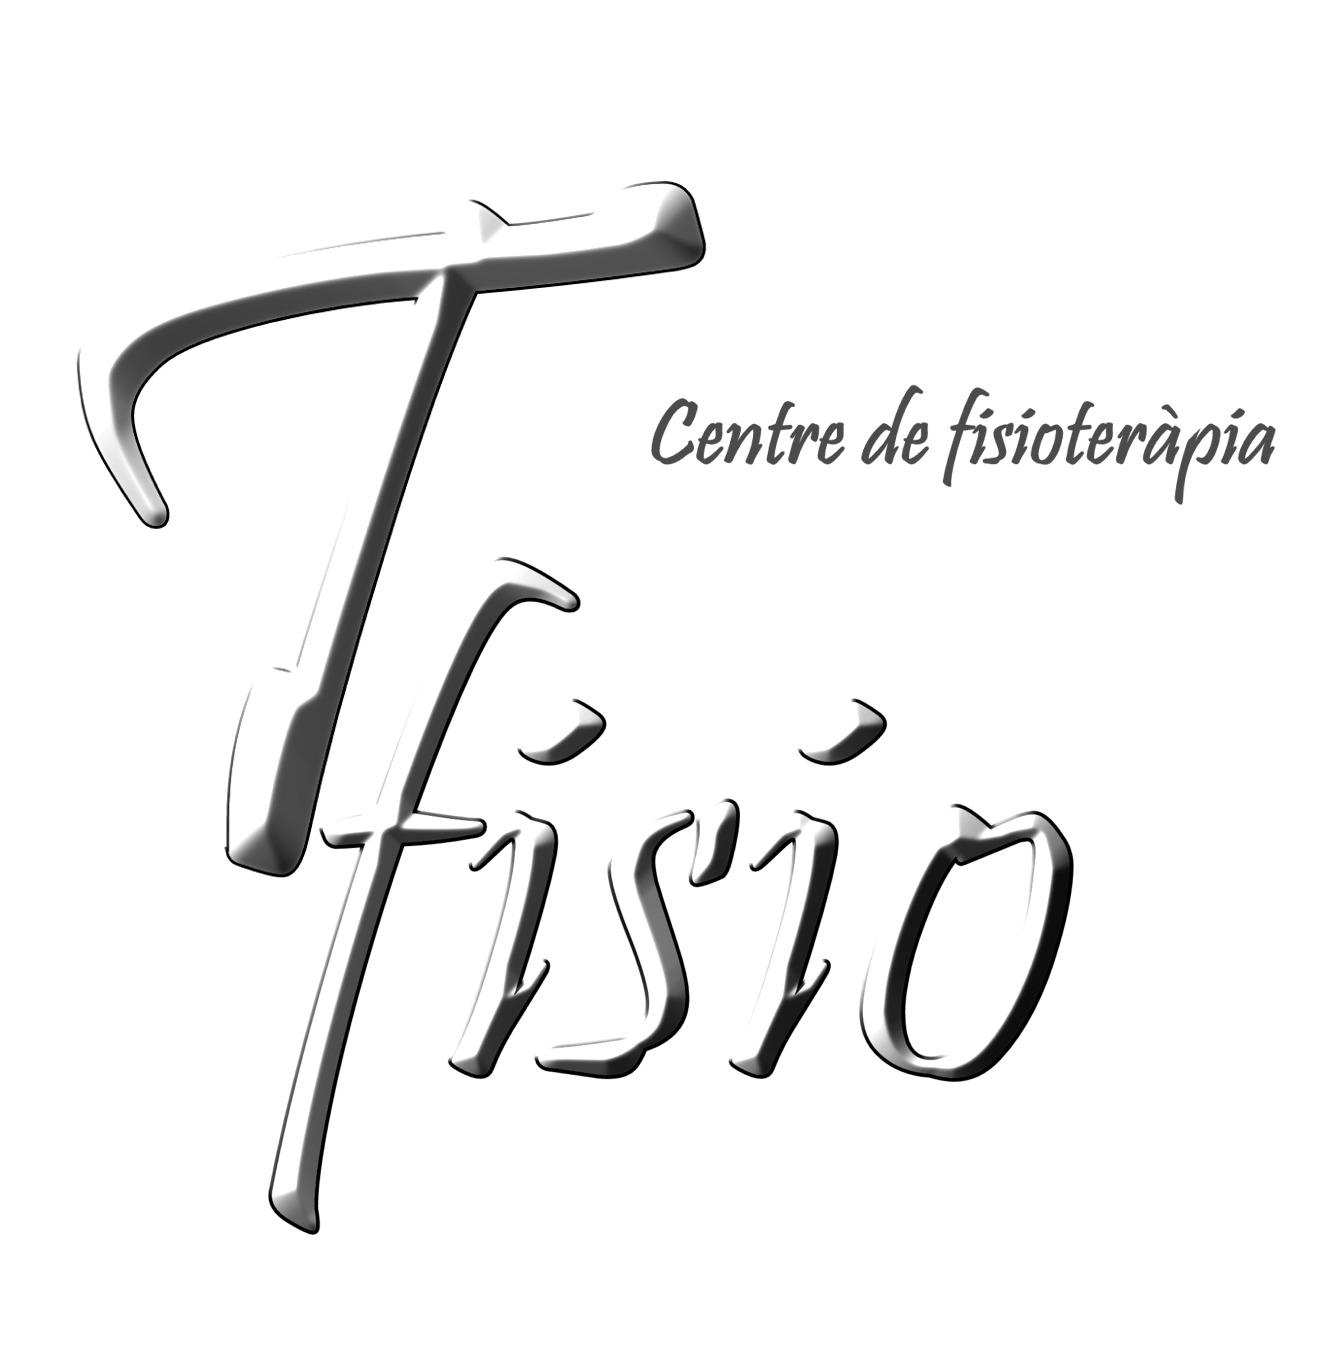 tfisio